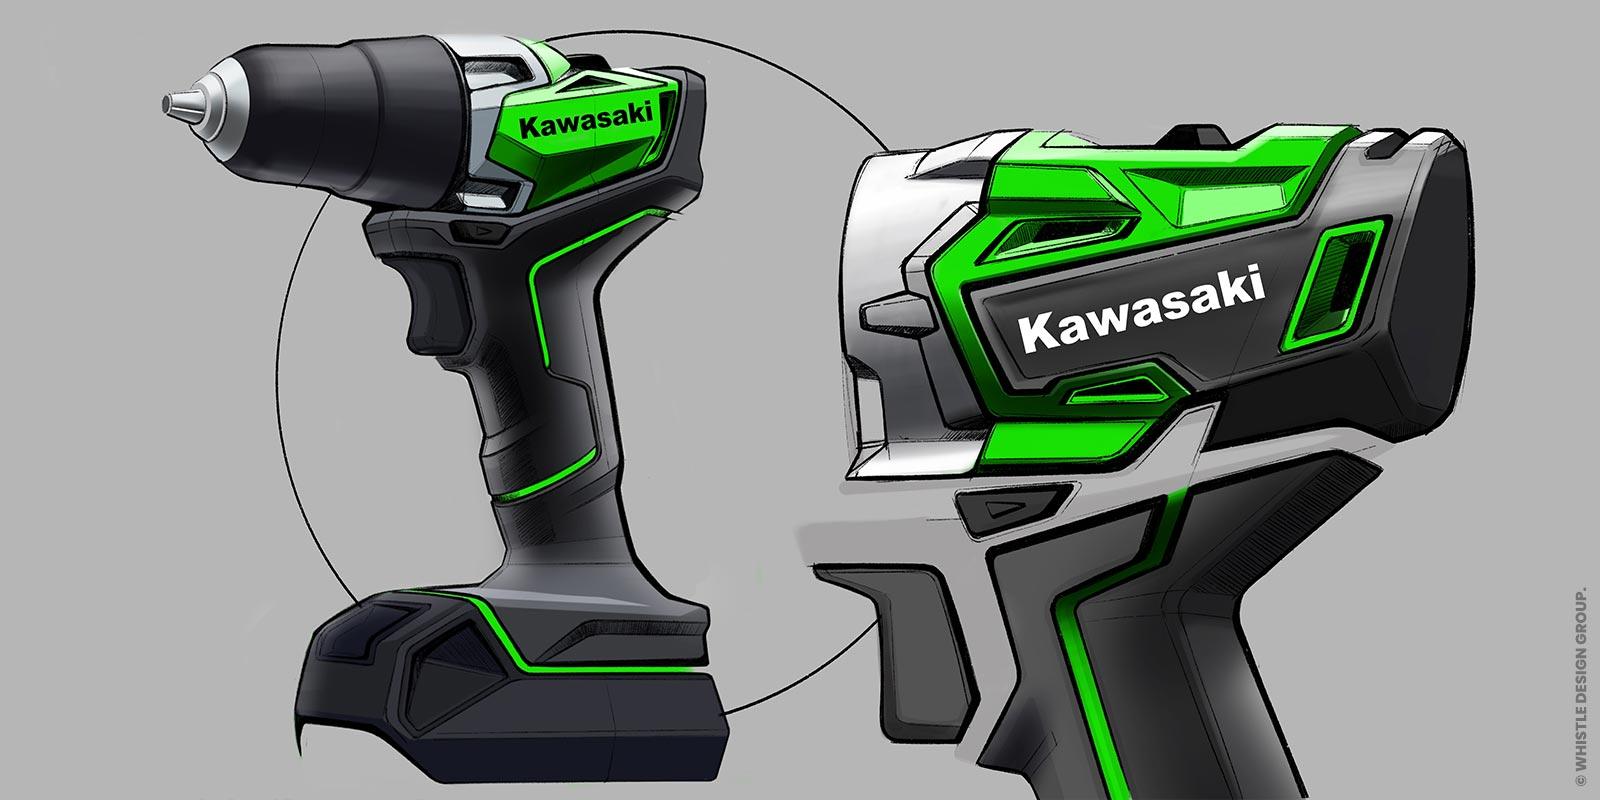 KAWASAKI DRILL DESIGN SKETCH 3